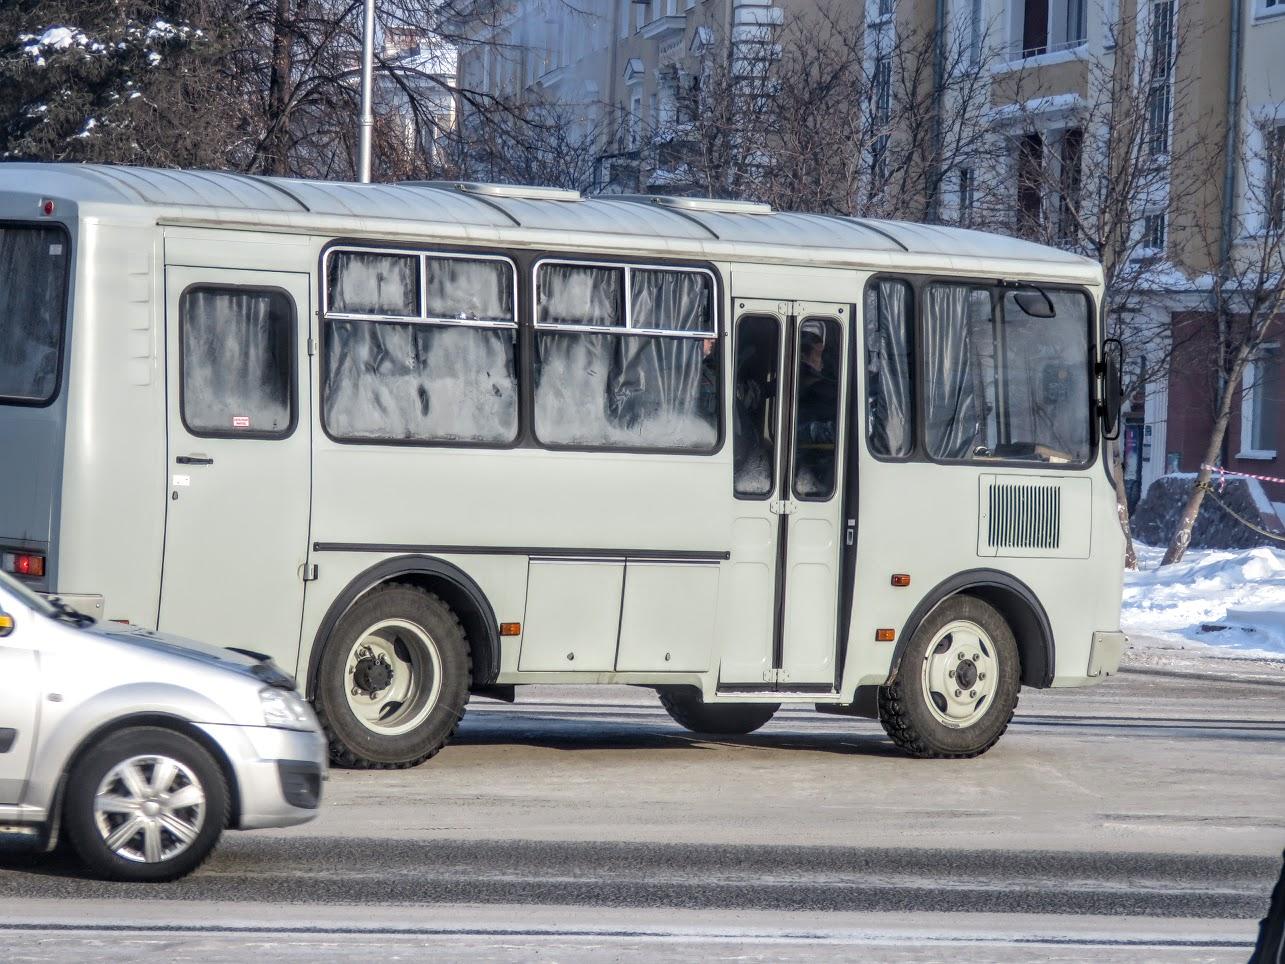 Транспорт не ходит - трамваи, троллейбусы. Полиция, люди, автозаки по городу IMG 1790